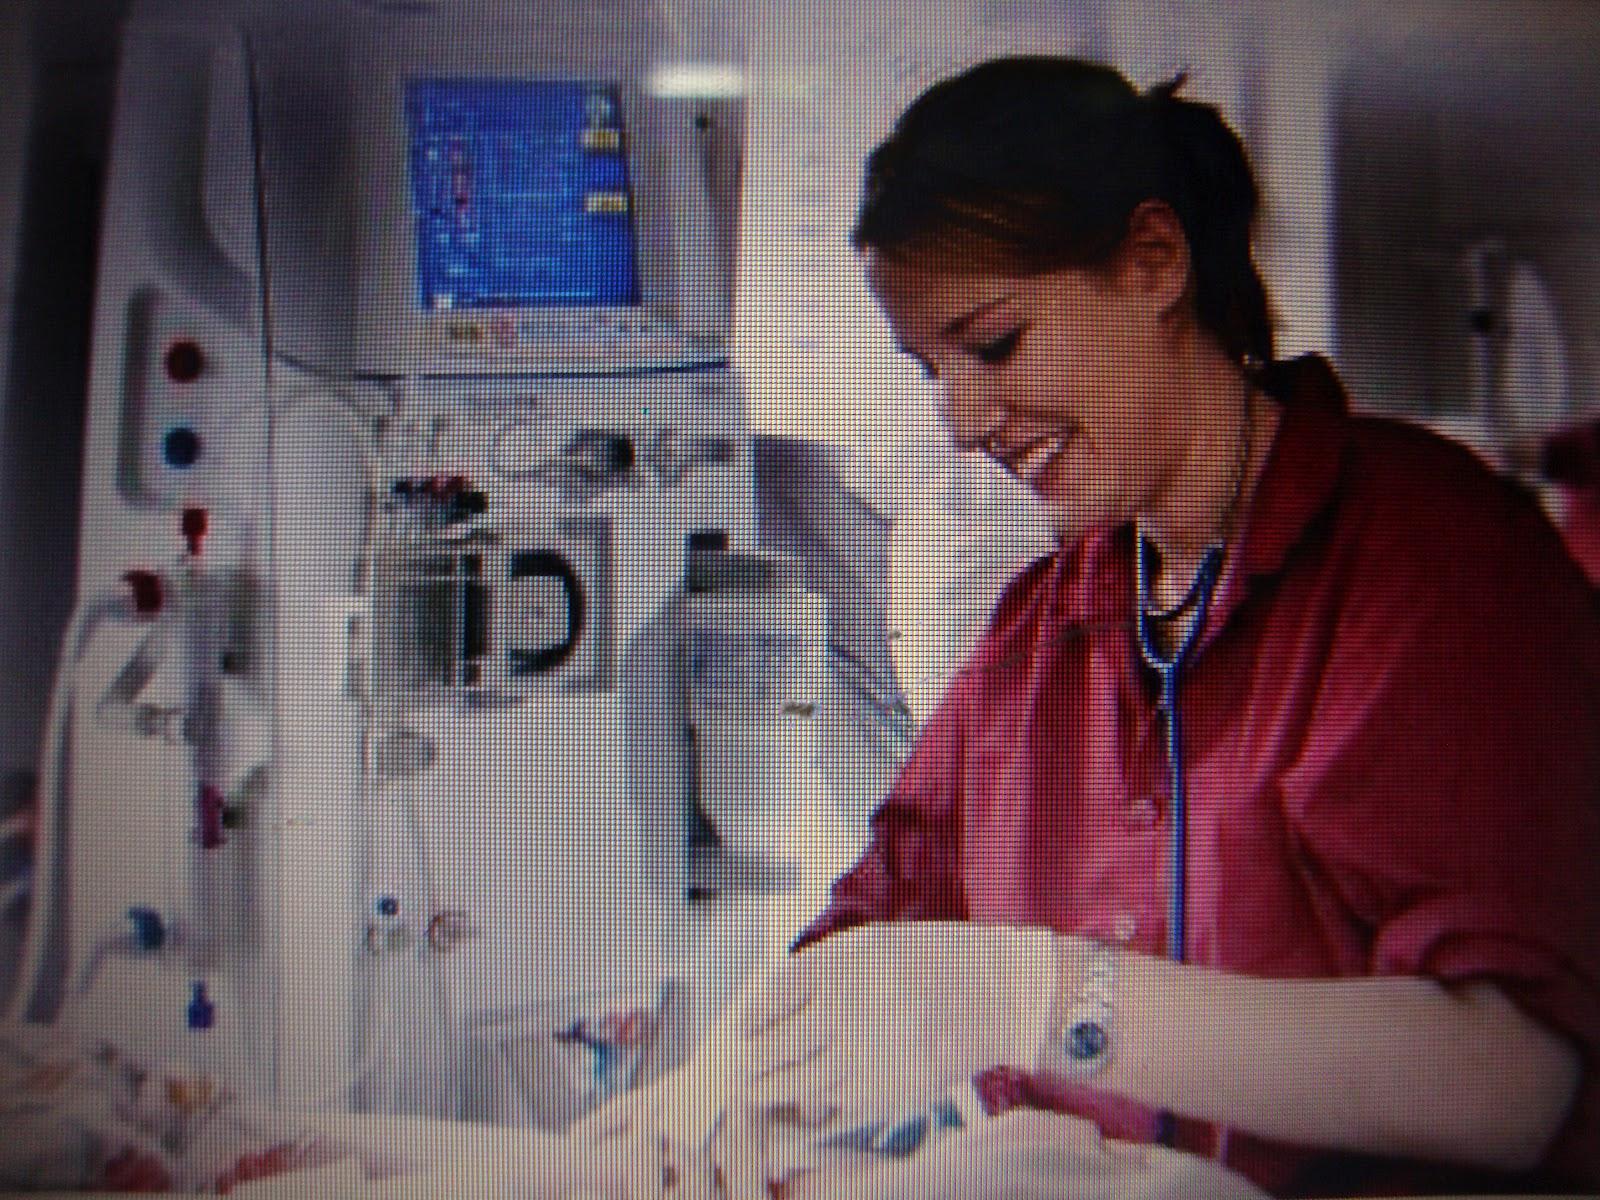 davita dialysis machine setup